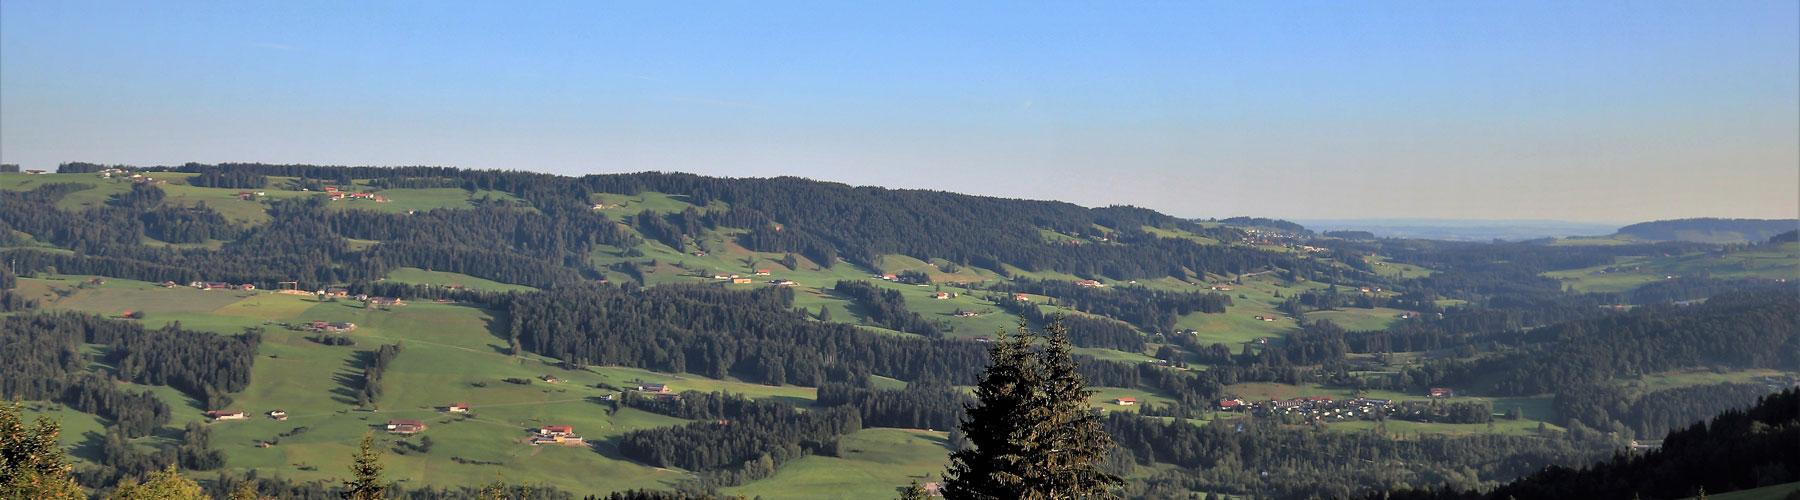 Panoramaausblick von Hochlitten